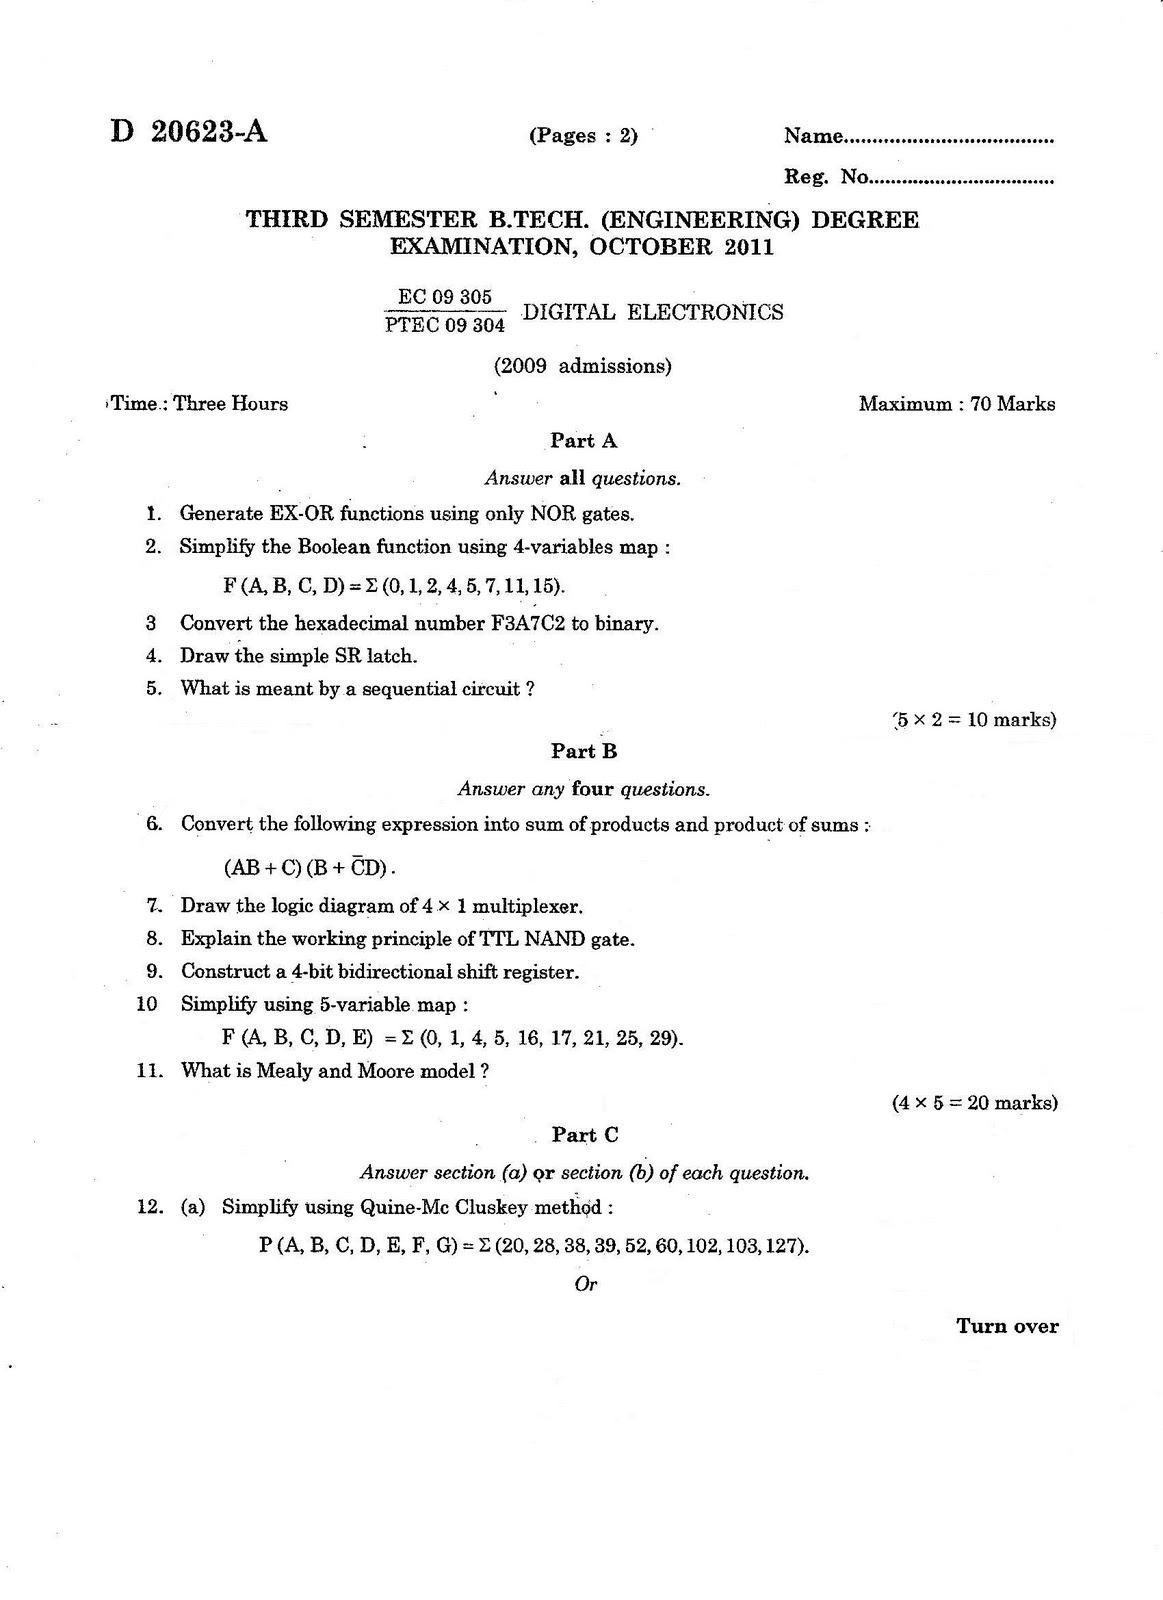 Btech Question Papers Calicut University Electronic Circuit Design Objective Questions Ec 09 303 Digital Electronics